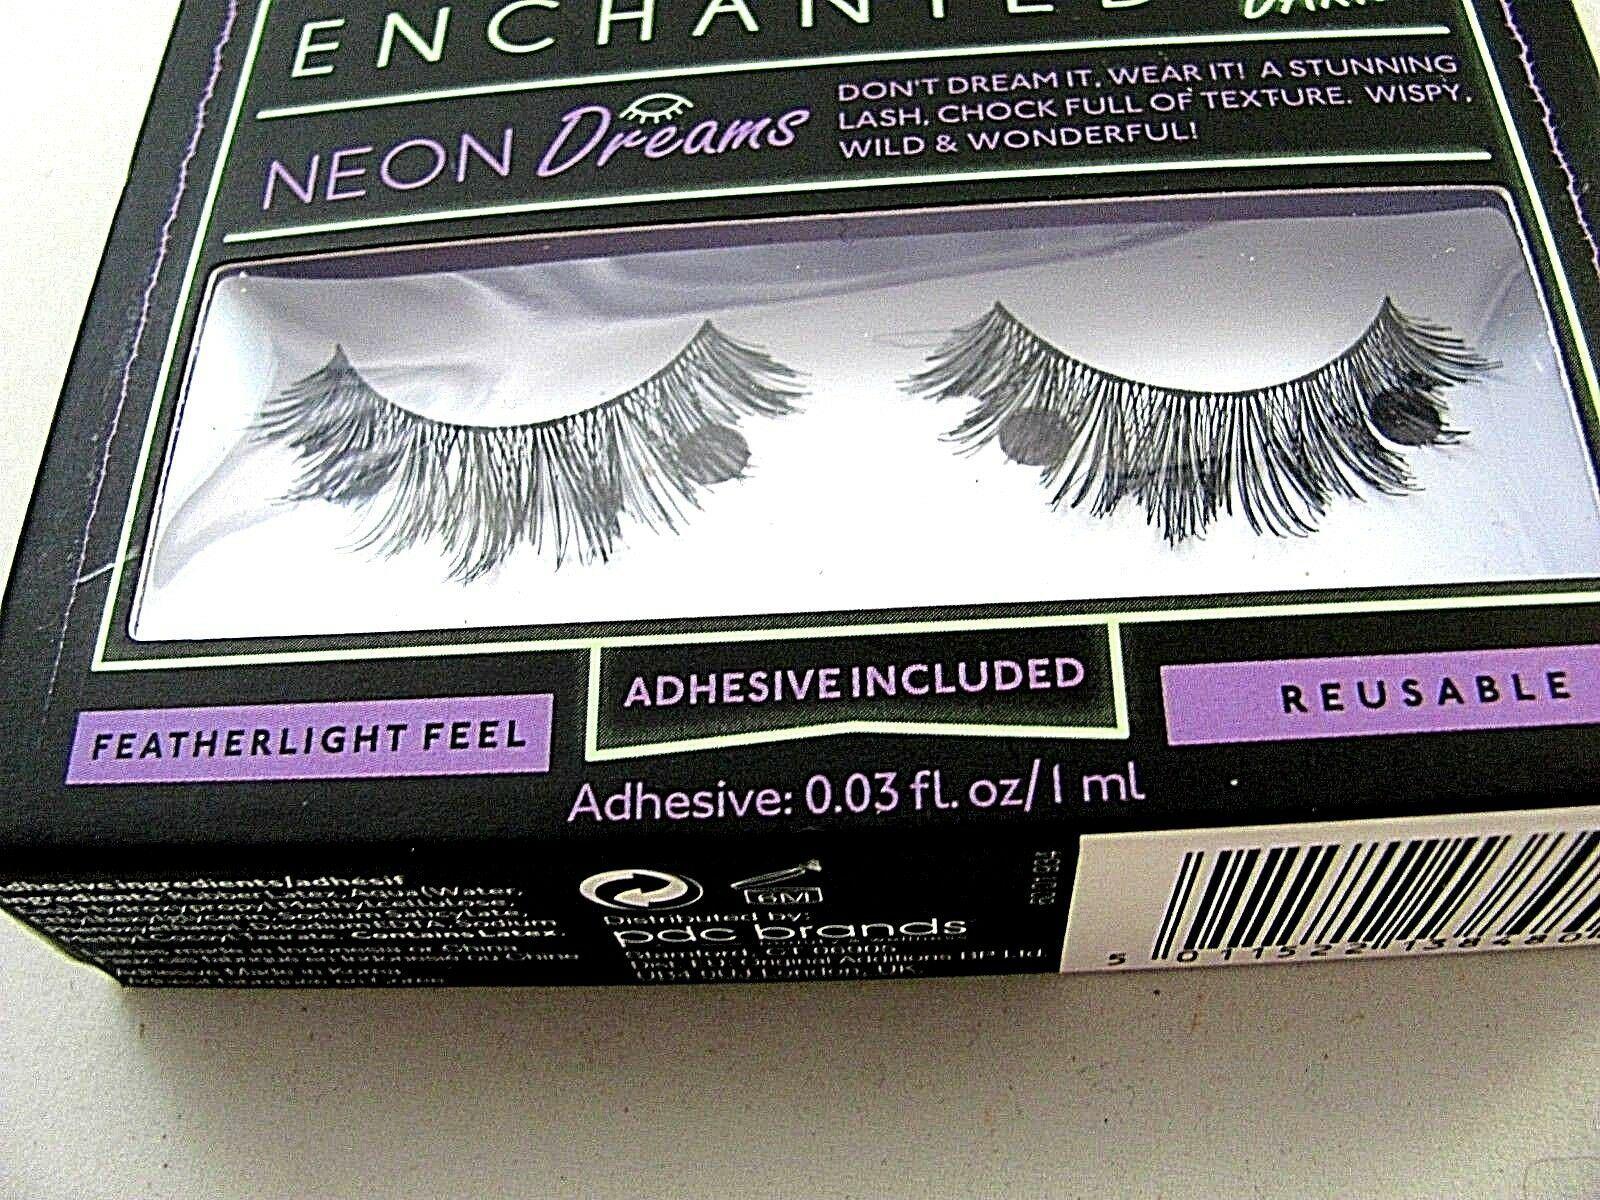 e6173ea3bb3 Eylure Enchanted After-Dark False Eyelashes Neon Dreams - 1 pair ...